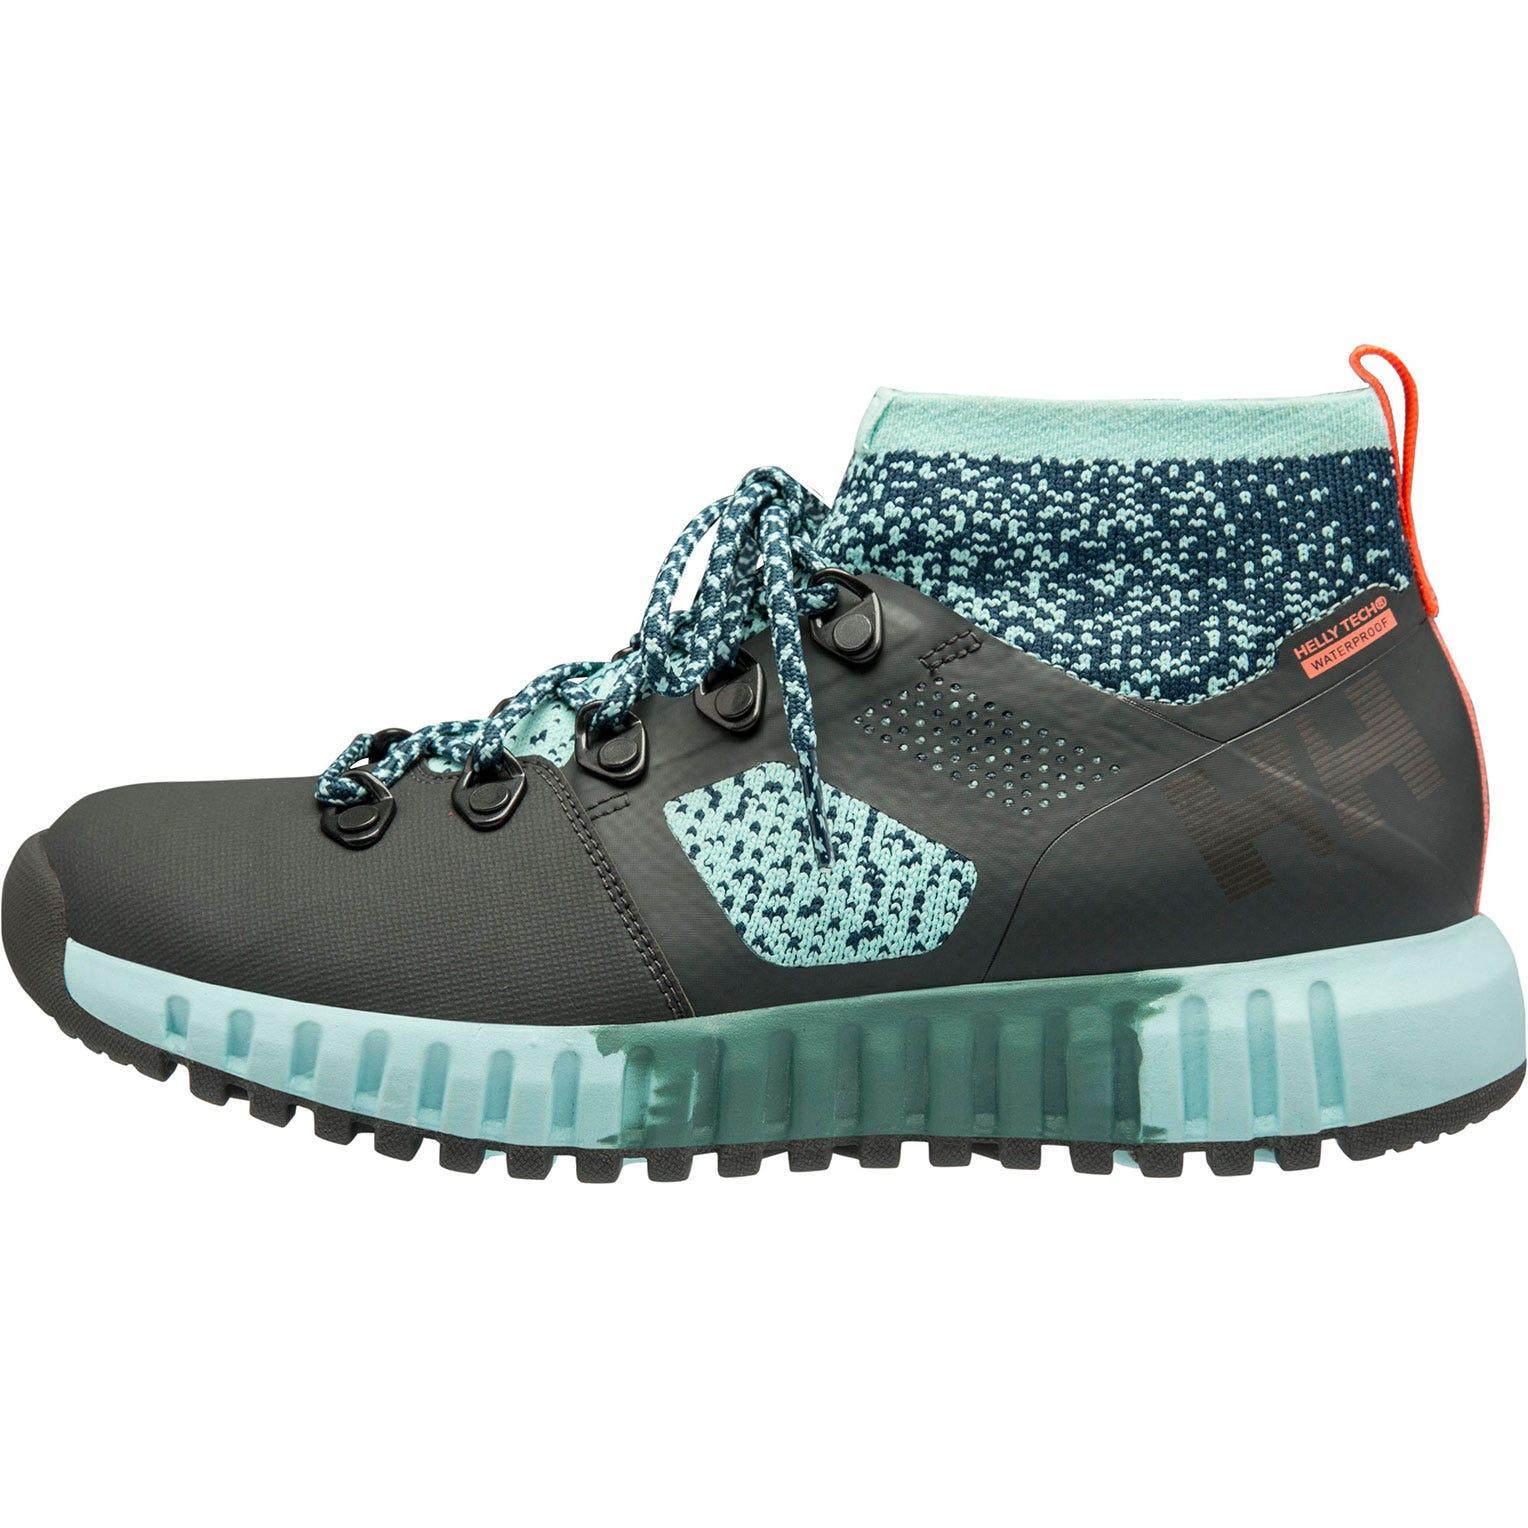 Helly Hansen W Vanir Canter Ht Womens Hiking Boot Black 36/5.5